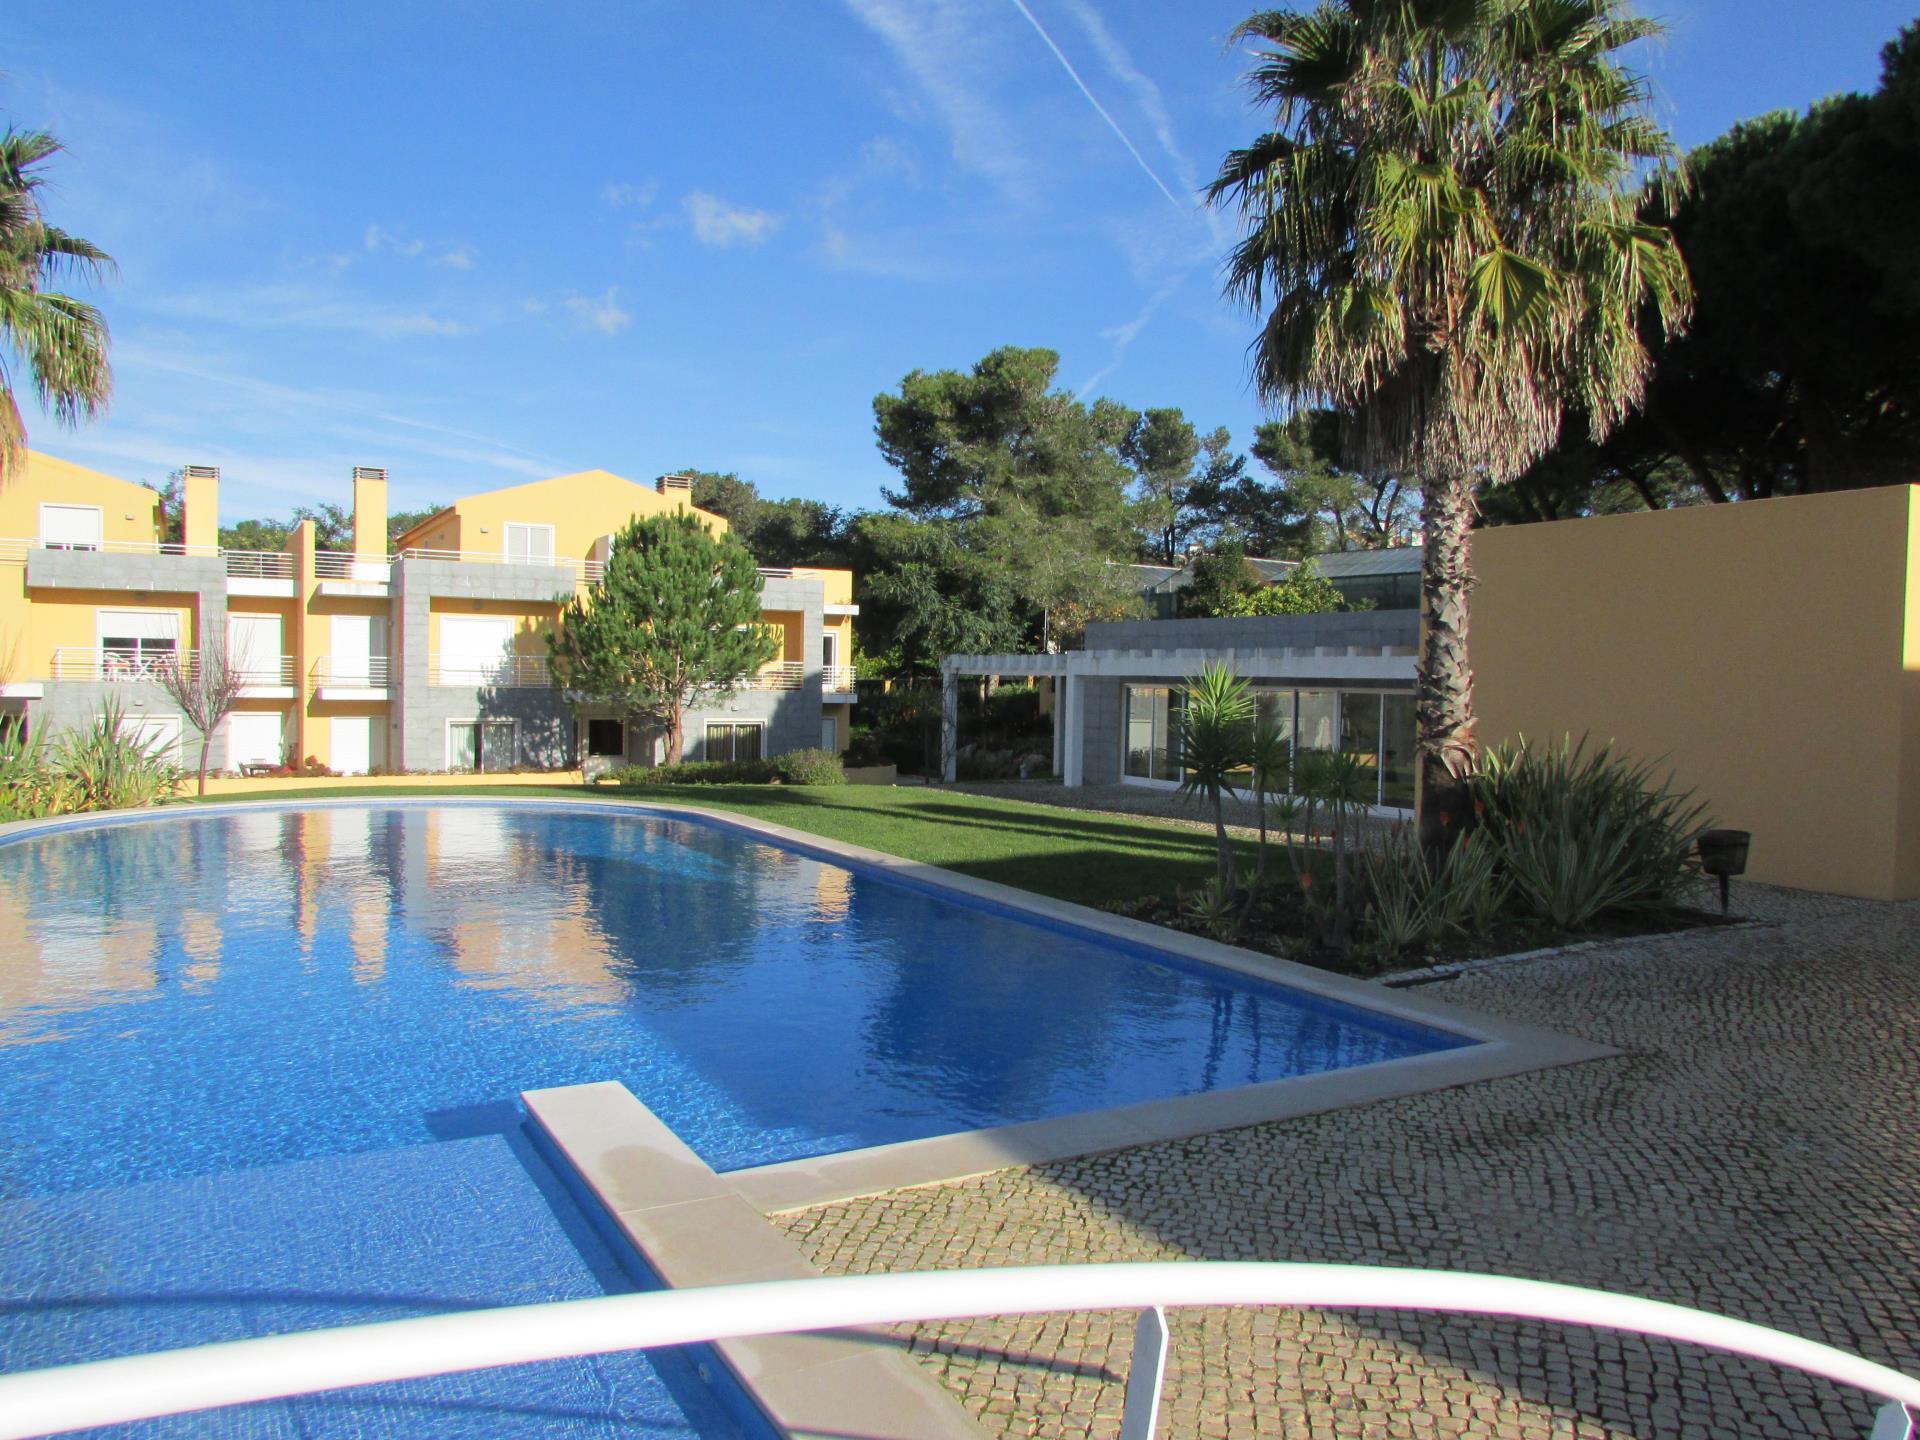 Duplex por un Venta en Duplex, 4 bedrooms, for Sale Birre, Cascais, Lisboa Portugal